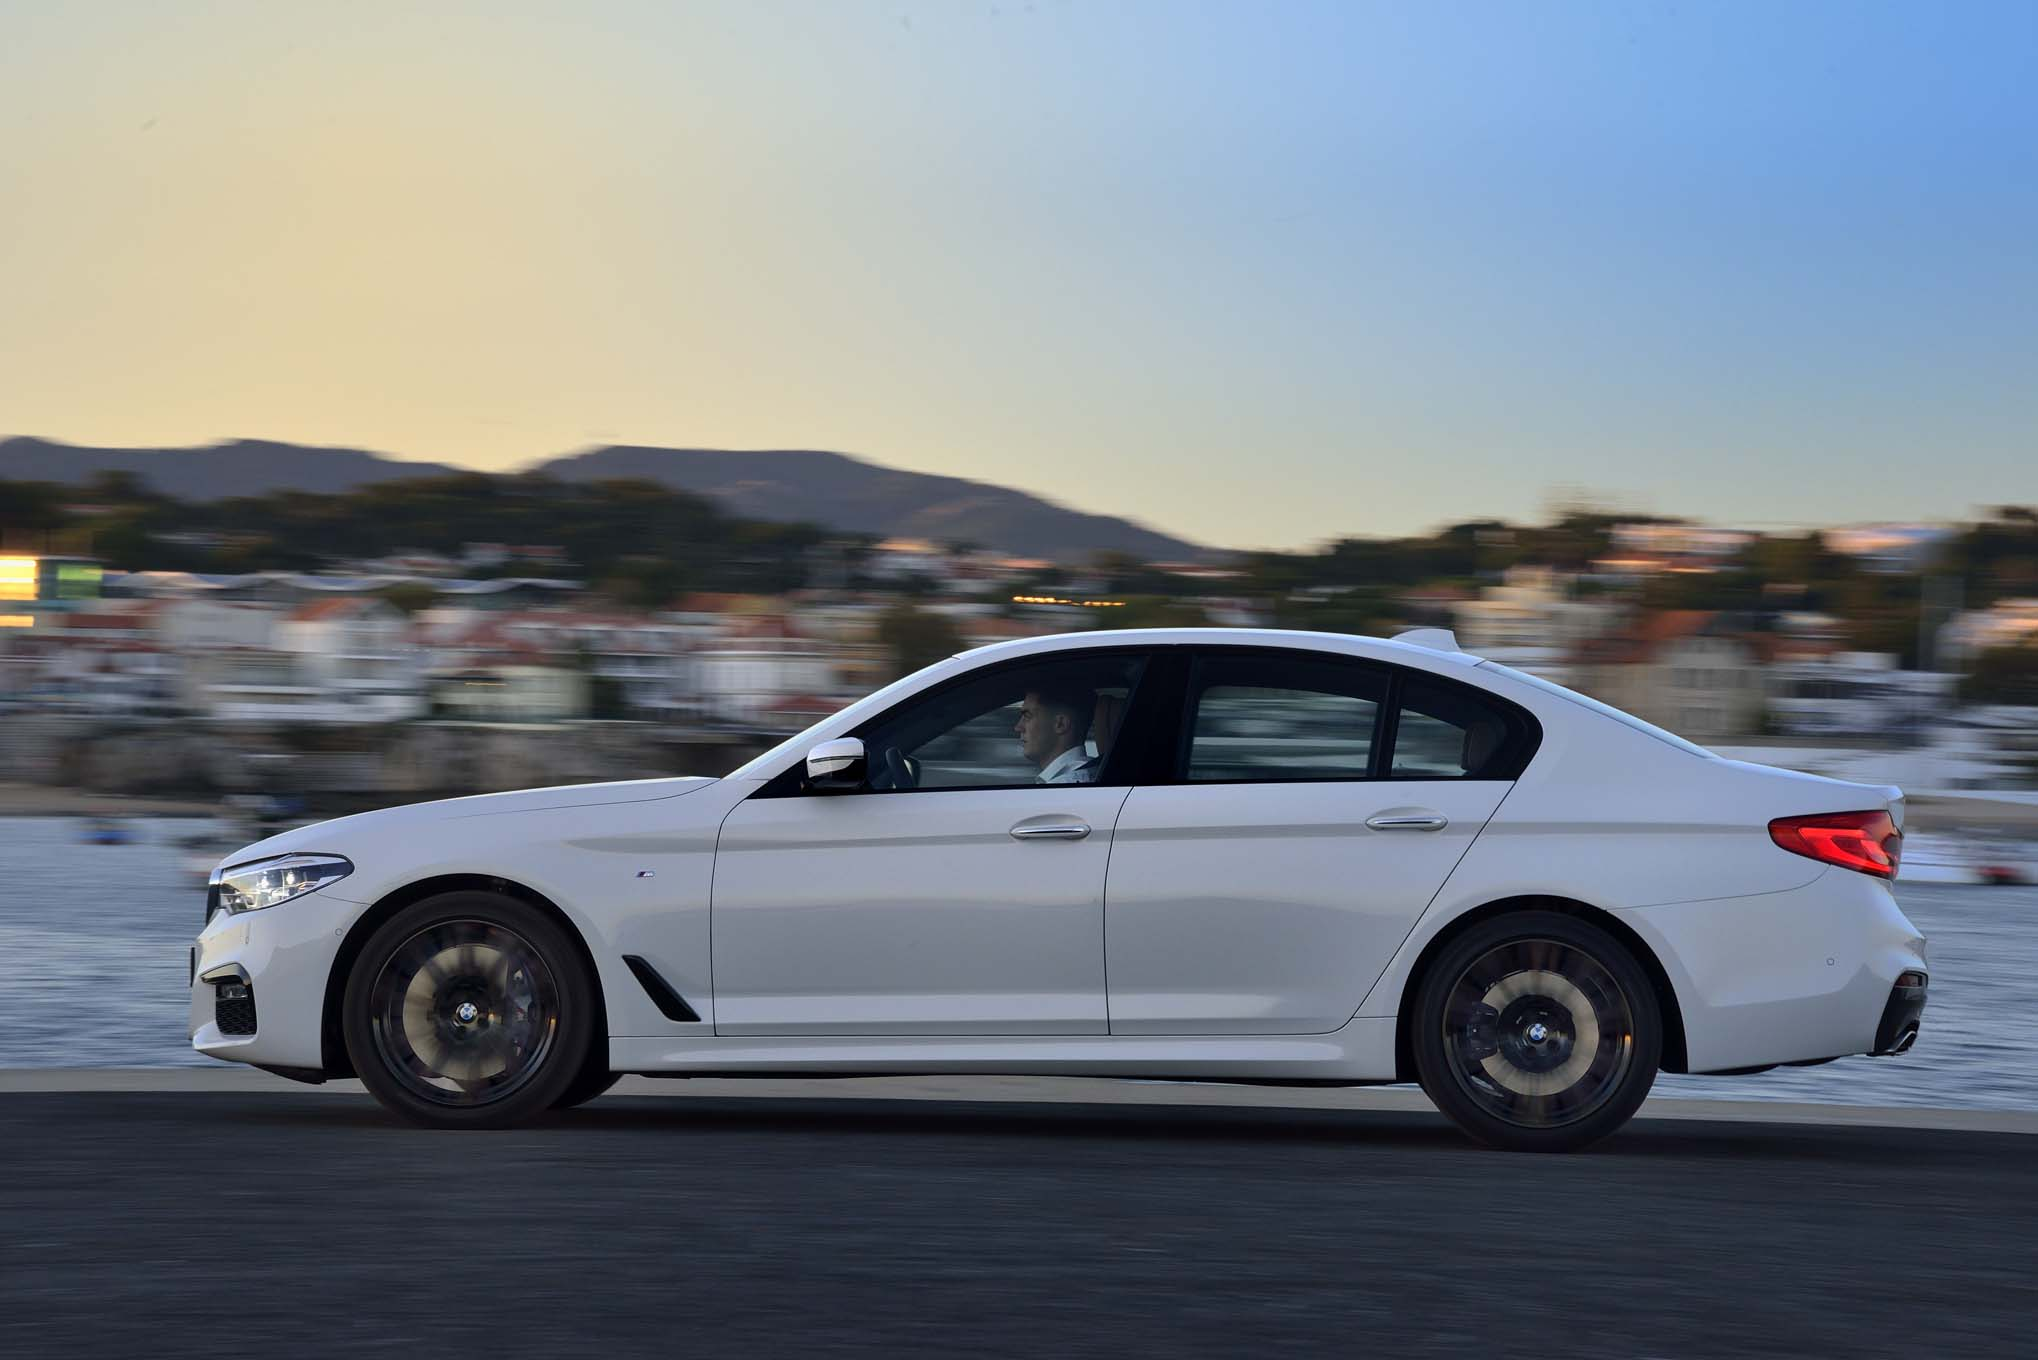 BMW 5 Series: Status field symbols